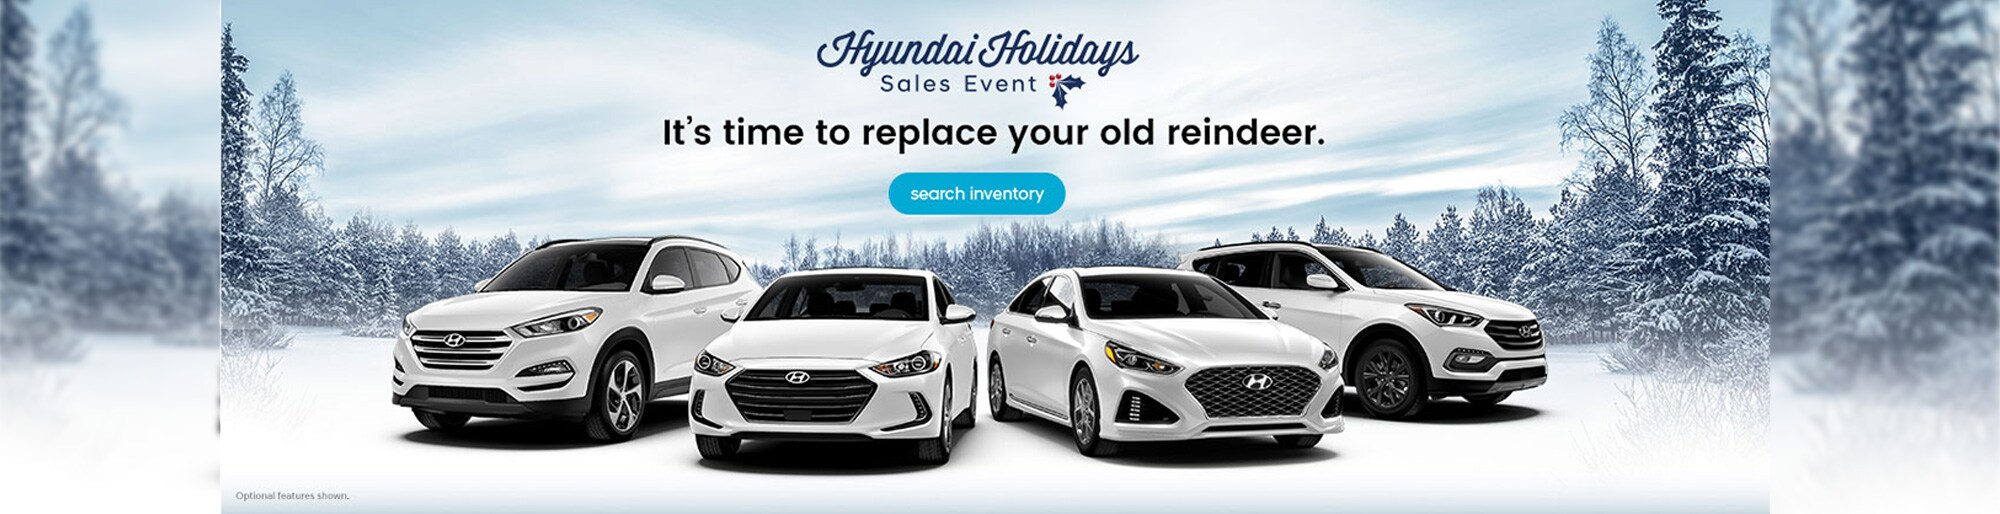 hyundai dealer spokane new used cars auto repair loans serving coeur d 39 alene post. Black Bedroom Furniture Sets. Home Design Ideas